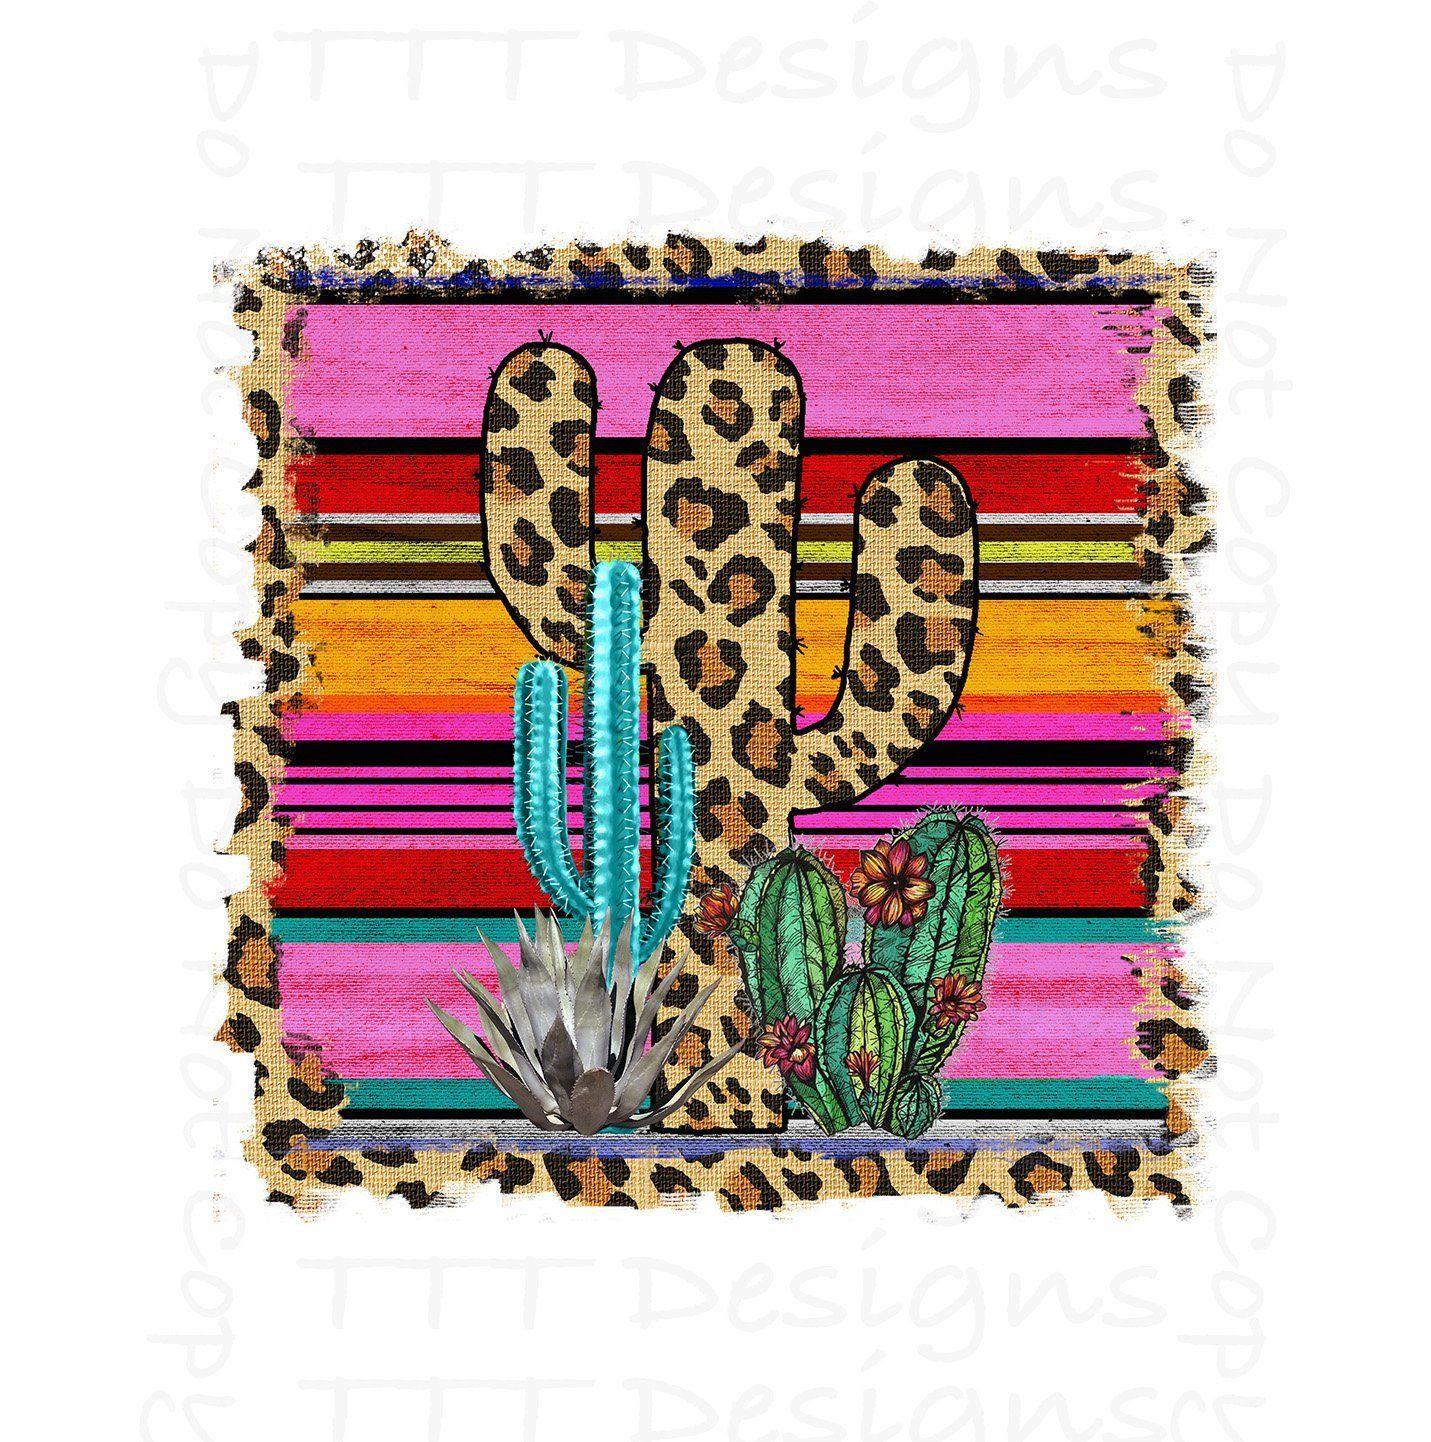 Cactus, Serape, Leopard, Sublimation Transfer, Ready to